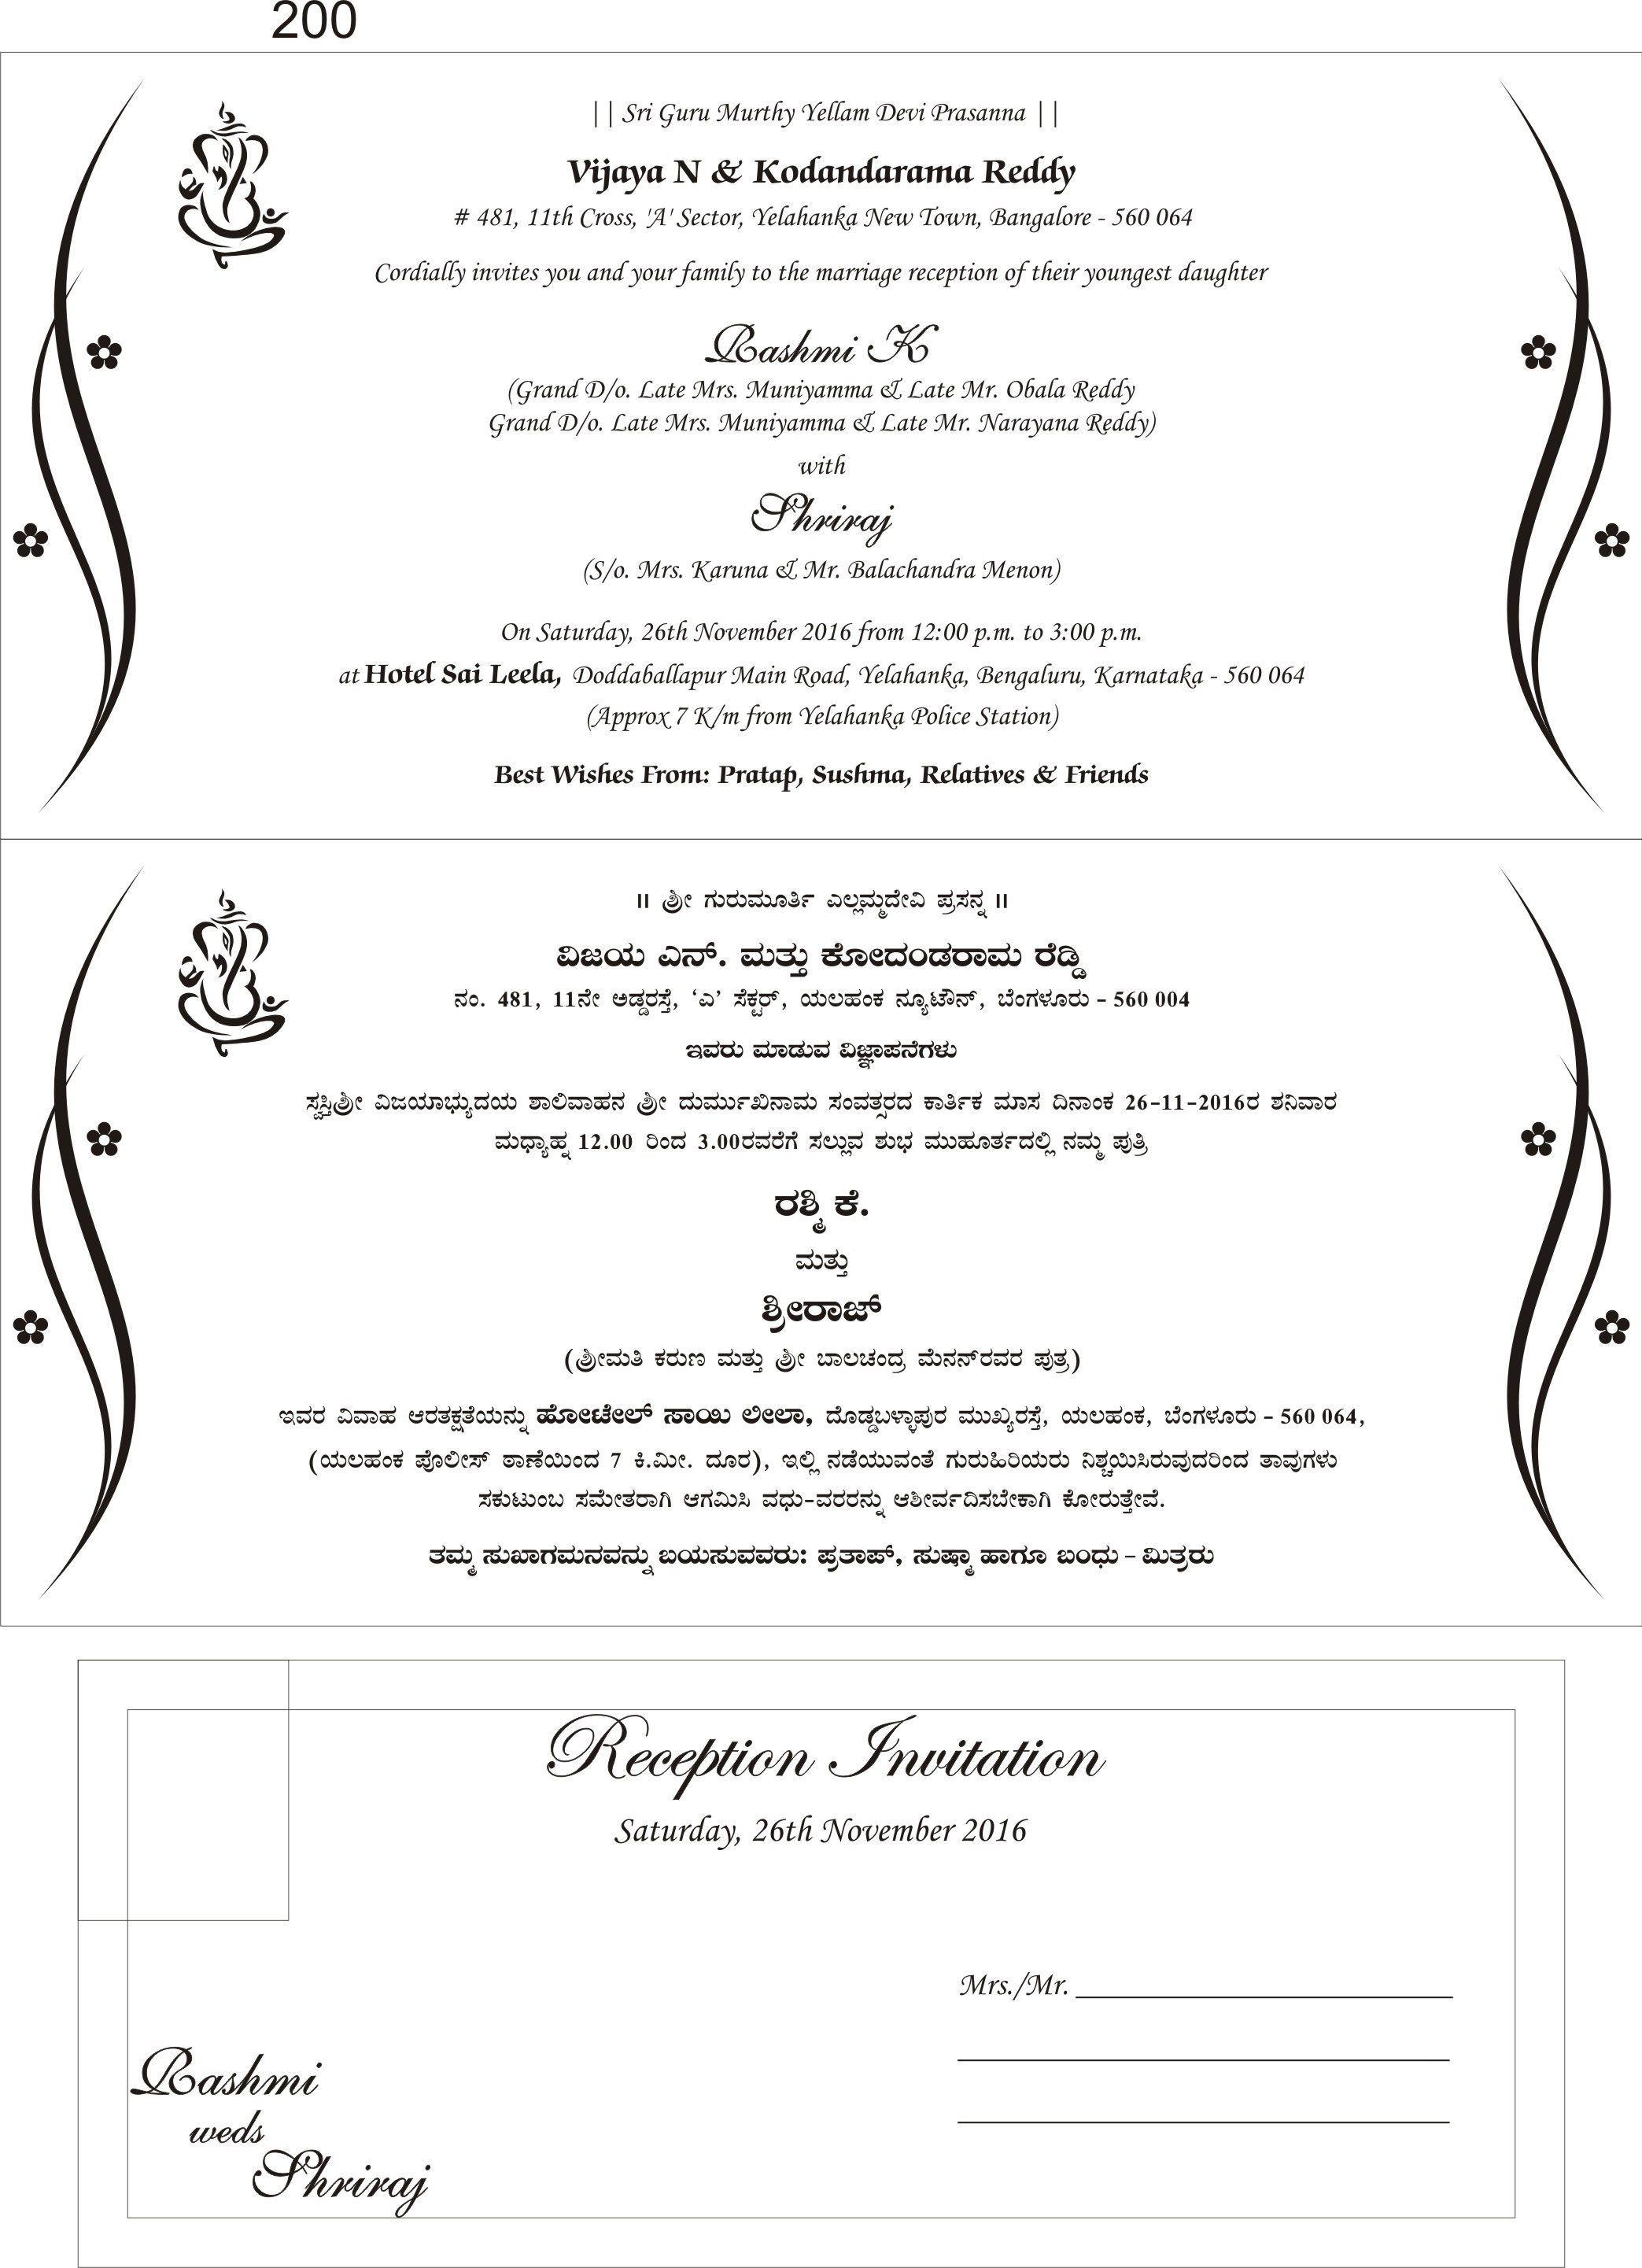 15 Best Of Friends Marriage Invitation Card Matter In Kannada